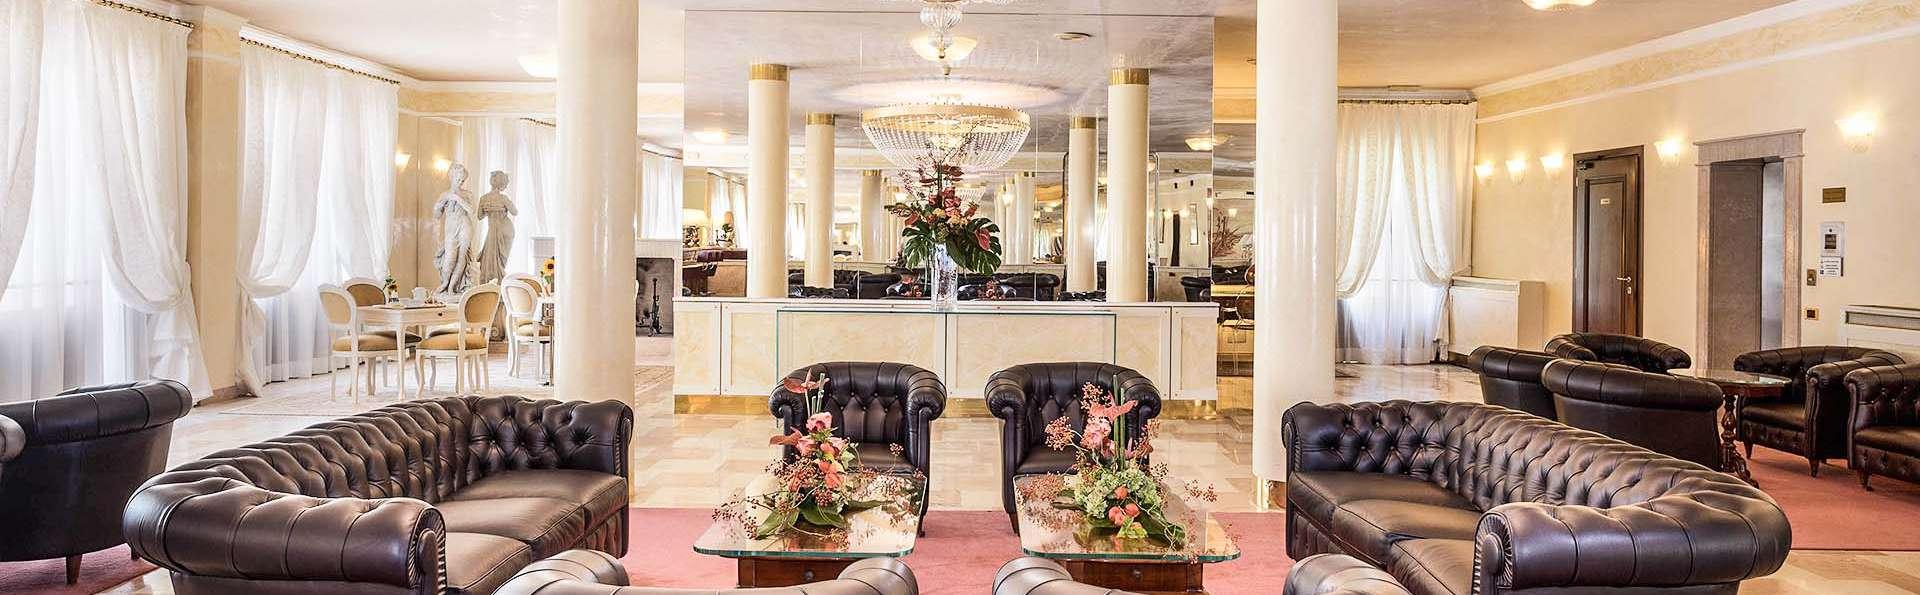 Villa Pace Park Hotel Bolognese - EDIT_Hall_01.jpg